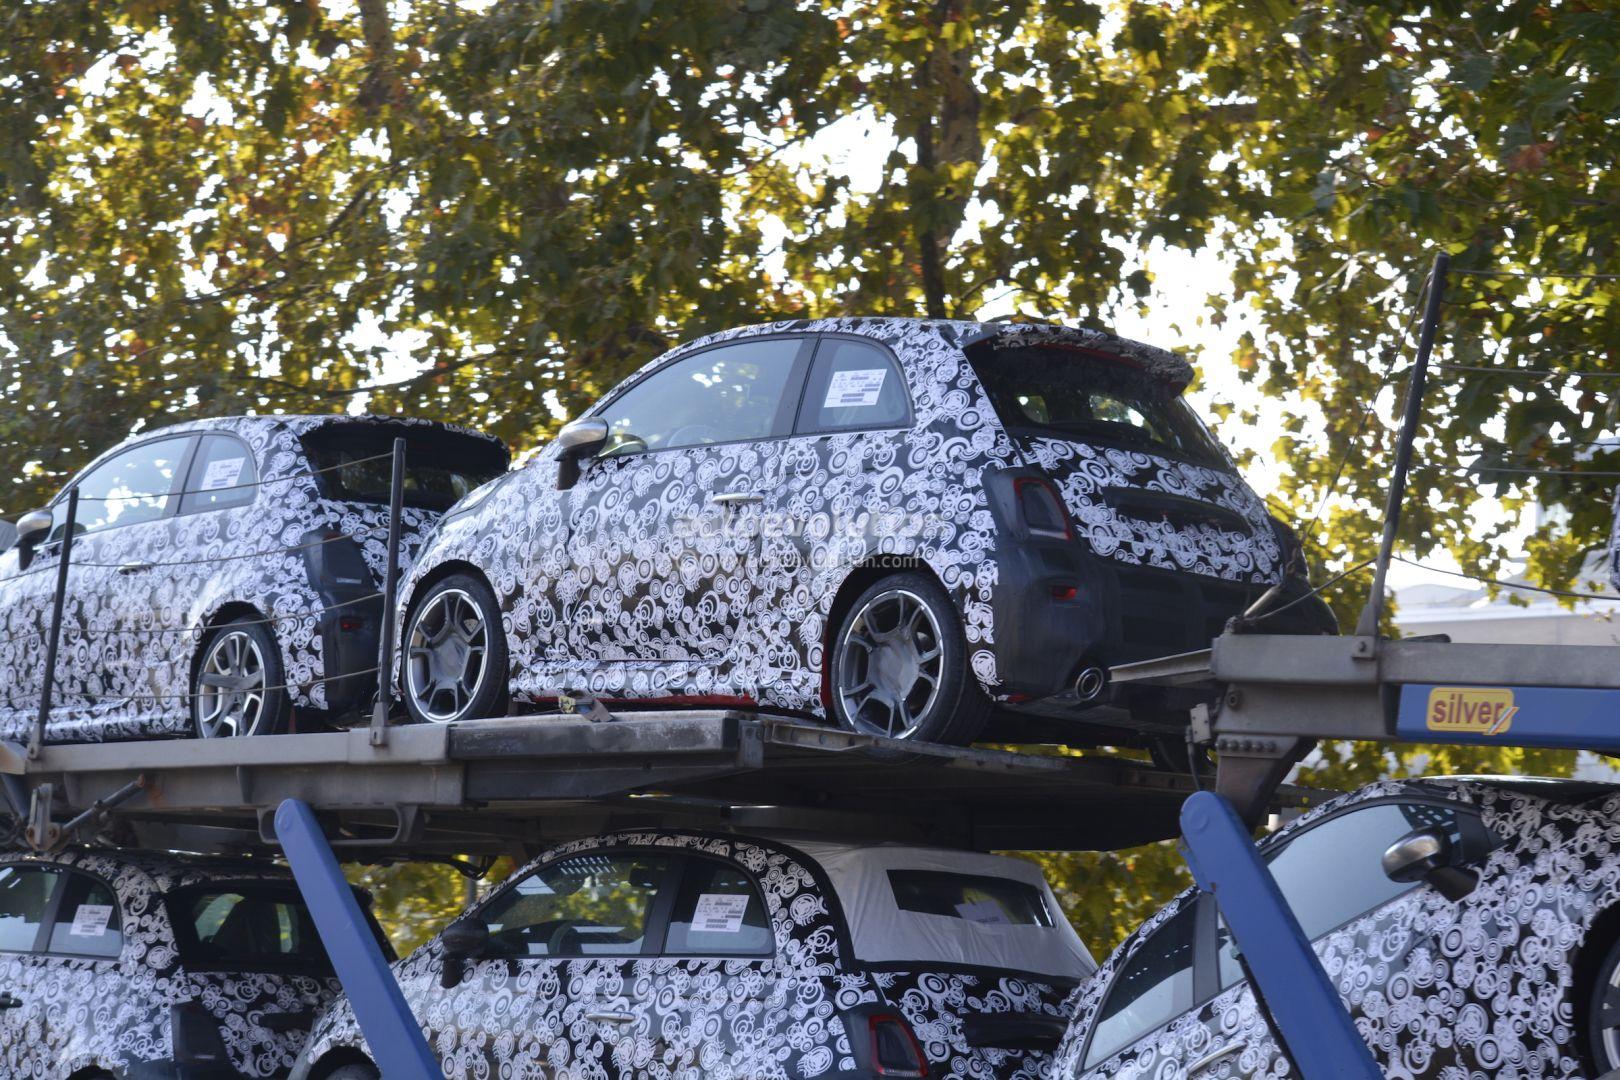 2017 Fiat 500 Abarth 500 Abarth Cabrio Facelift Spied